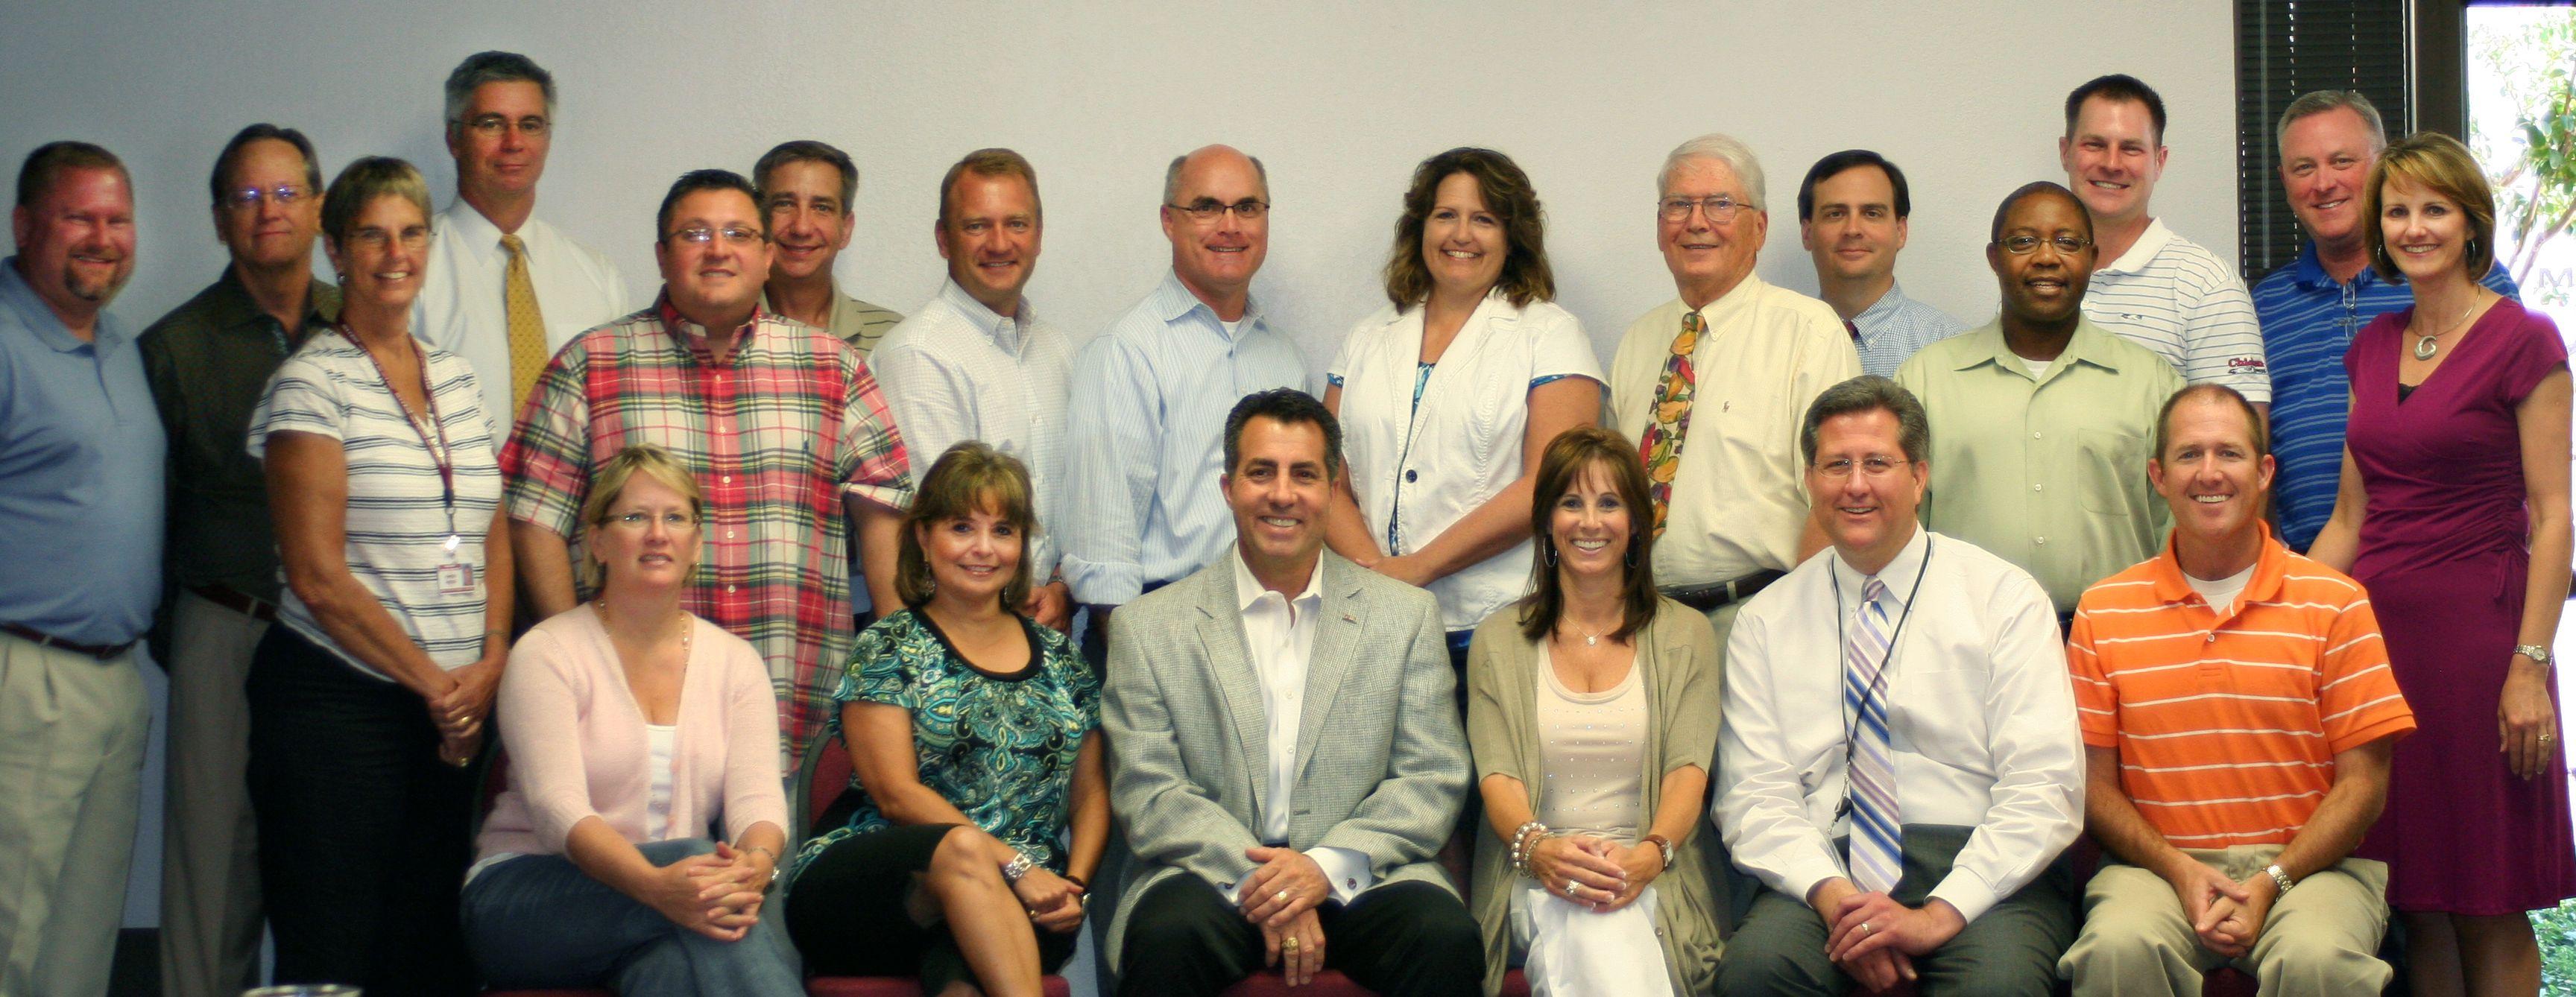 2011-12 Board of Directors